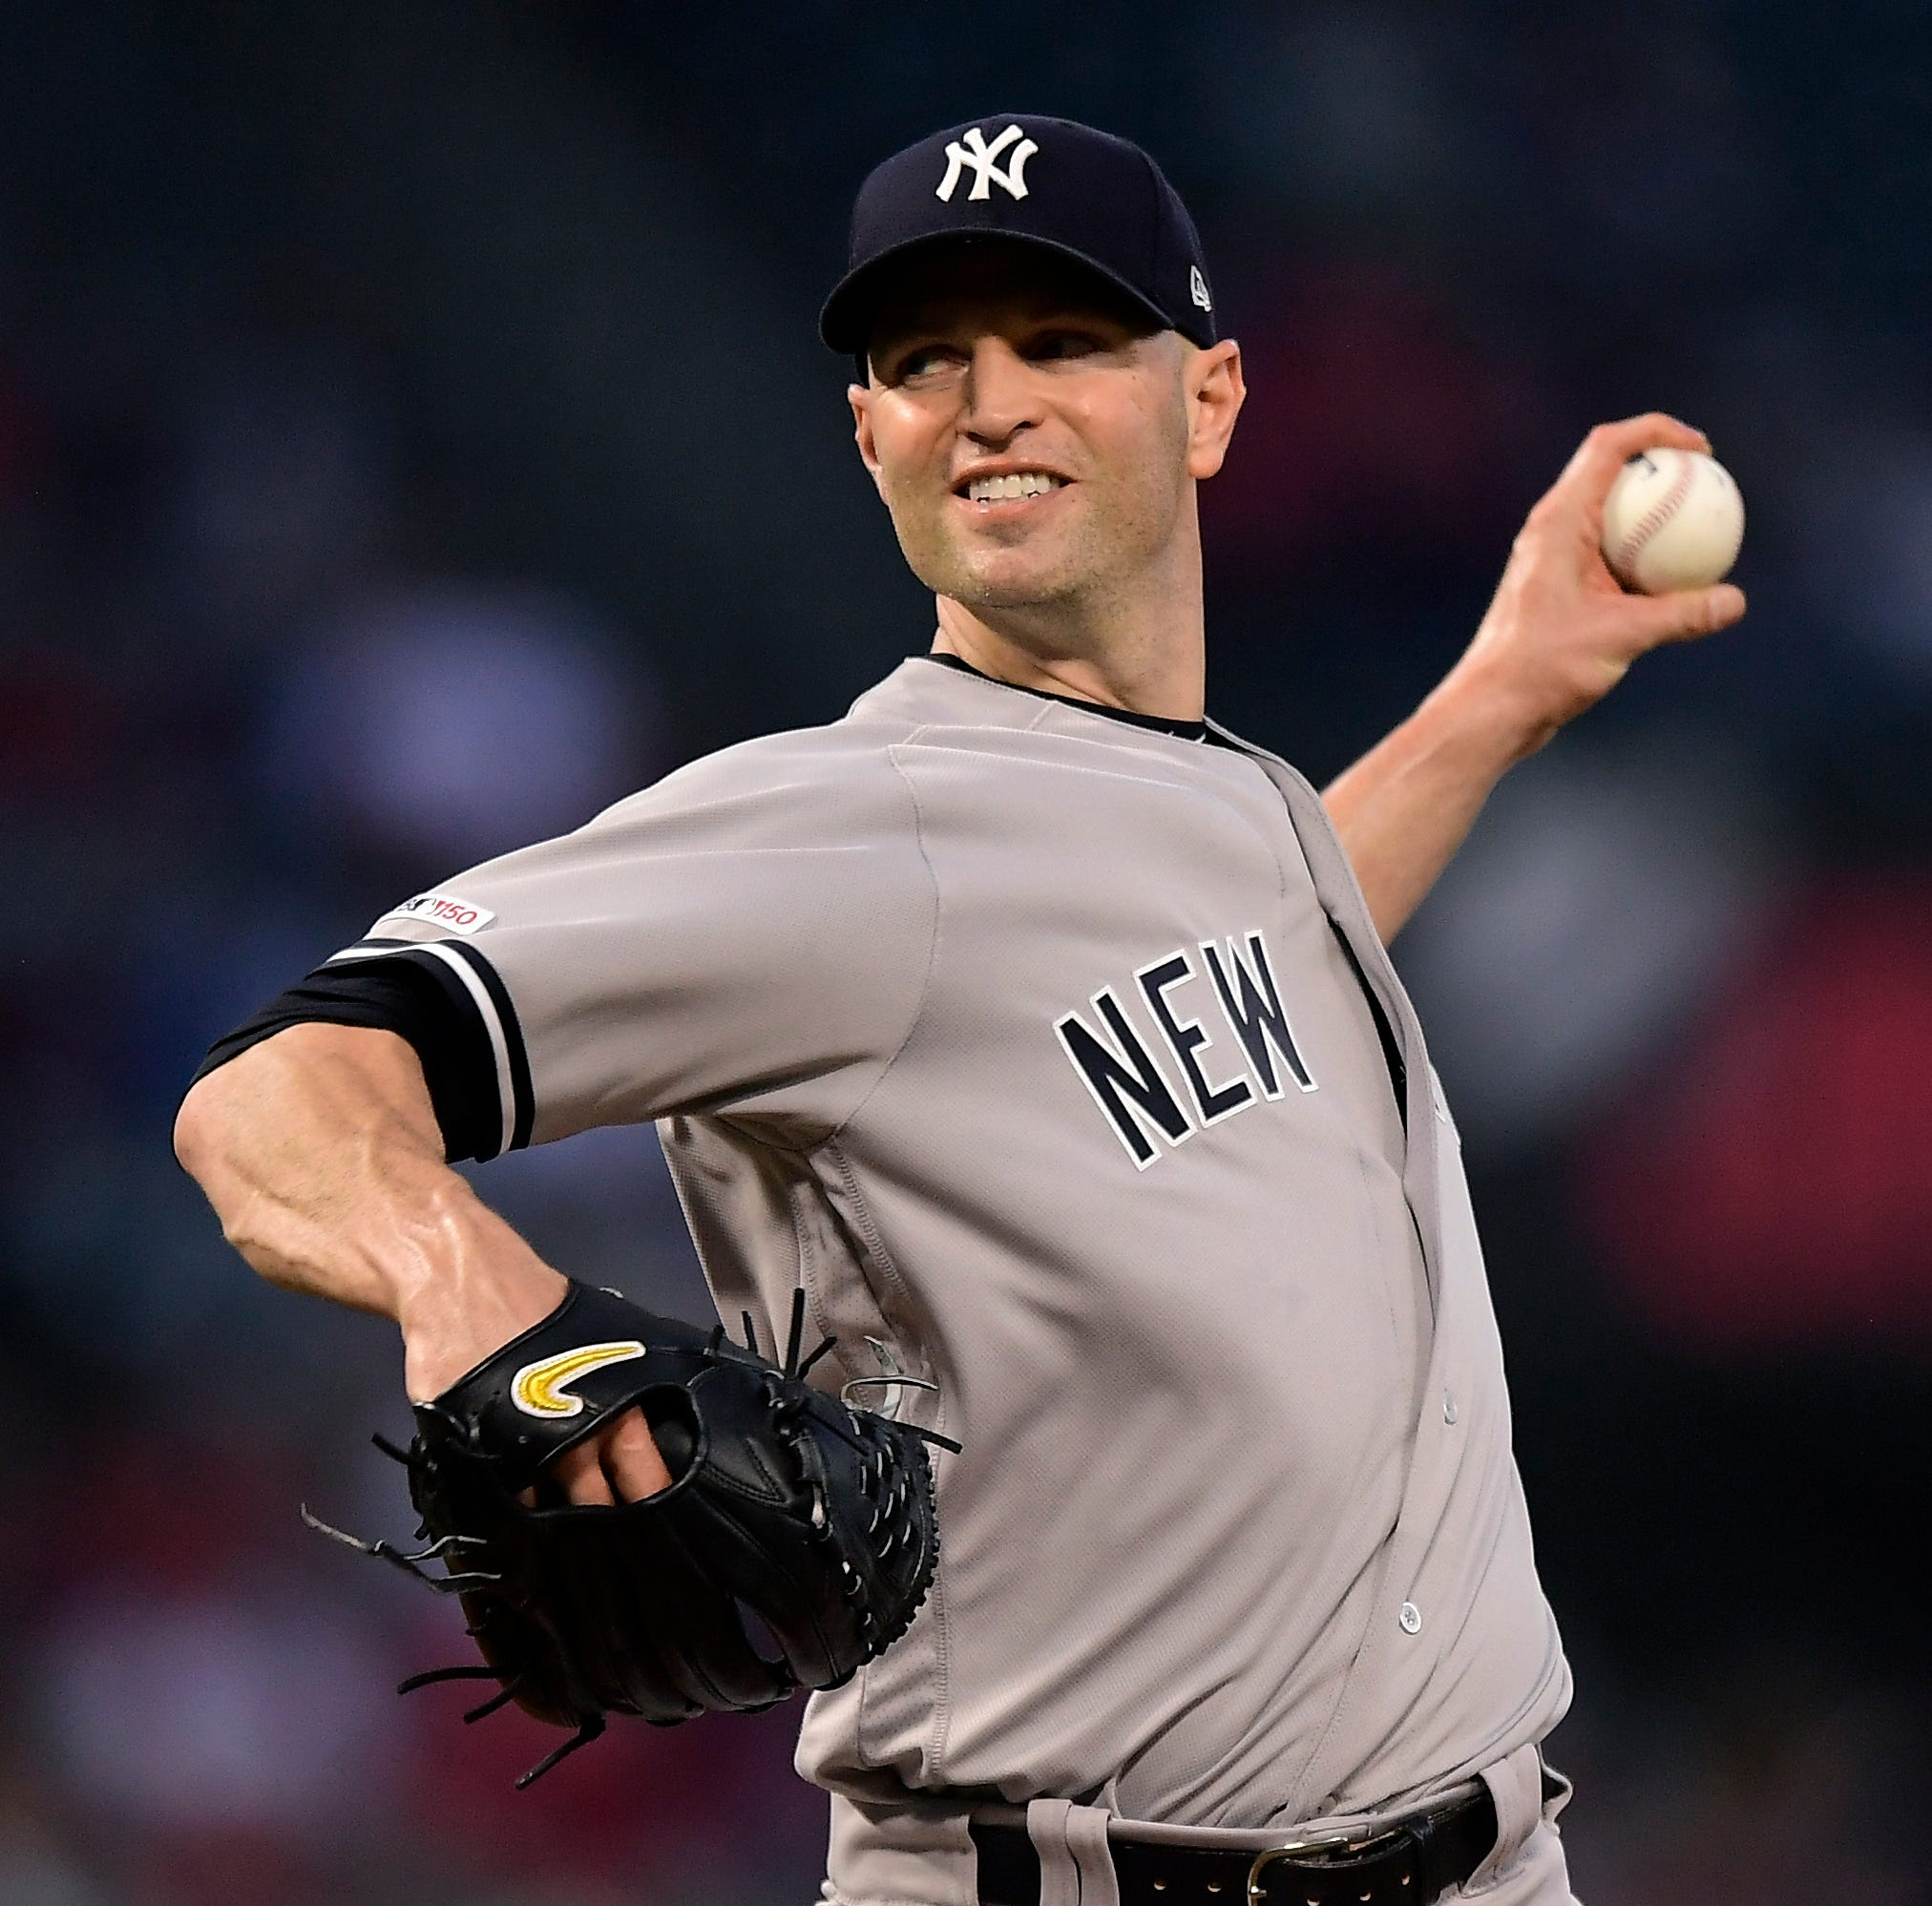 New York Yankees, Kansas City Royals announce Game 1 lineups for Saturday